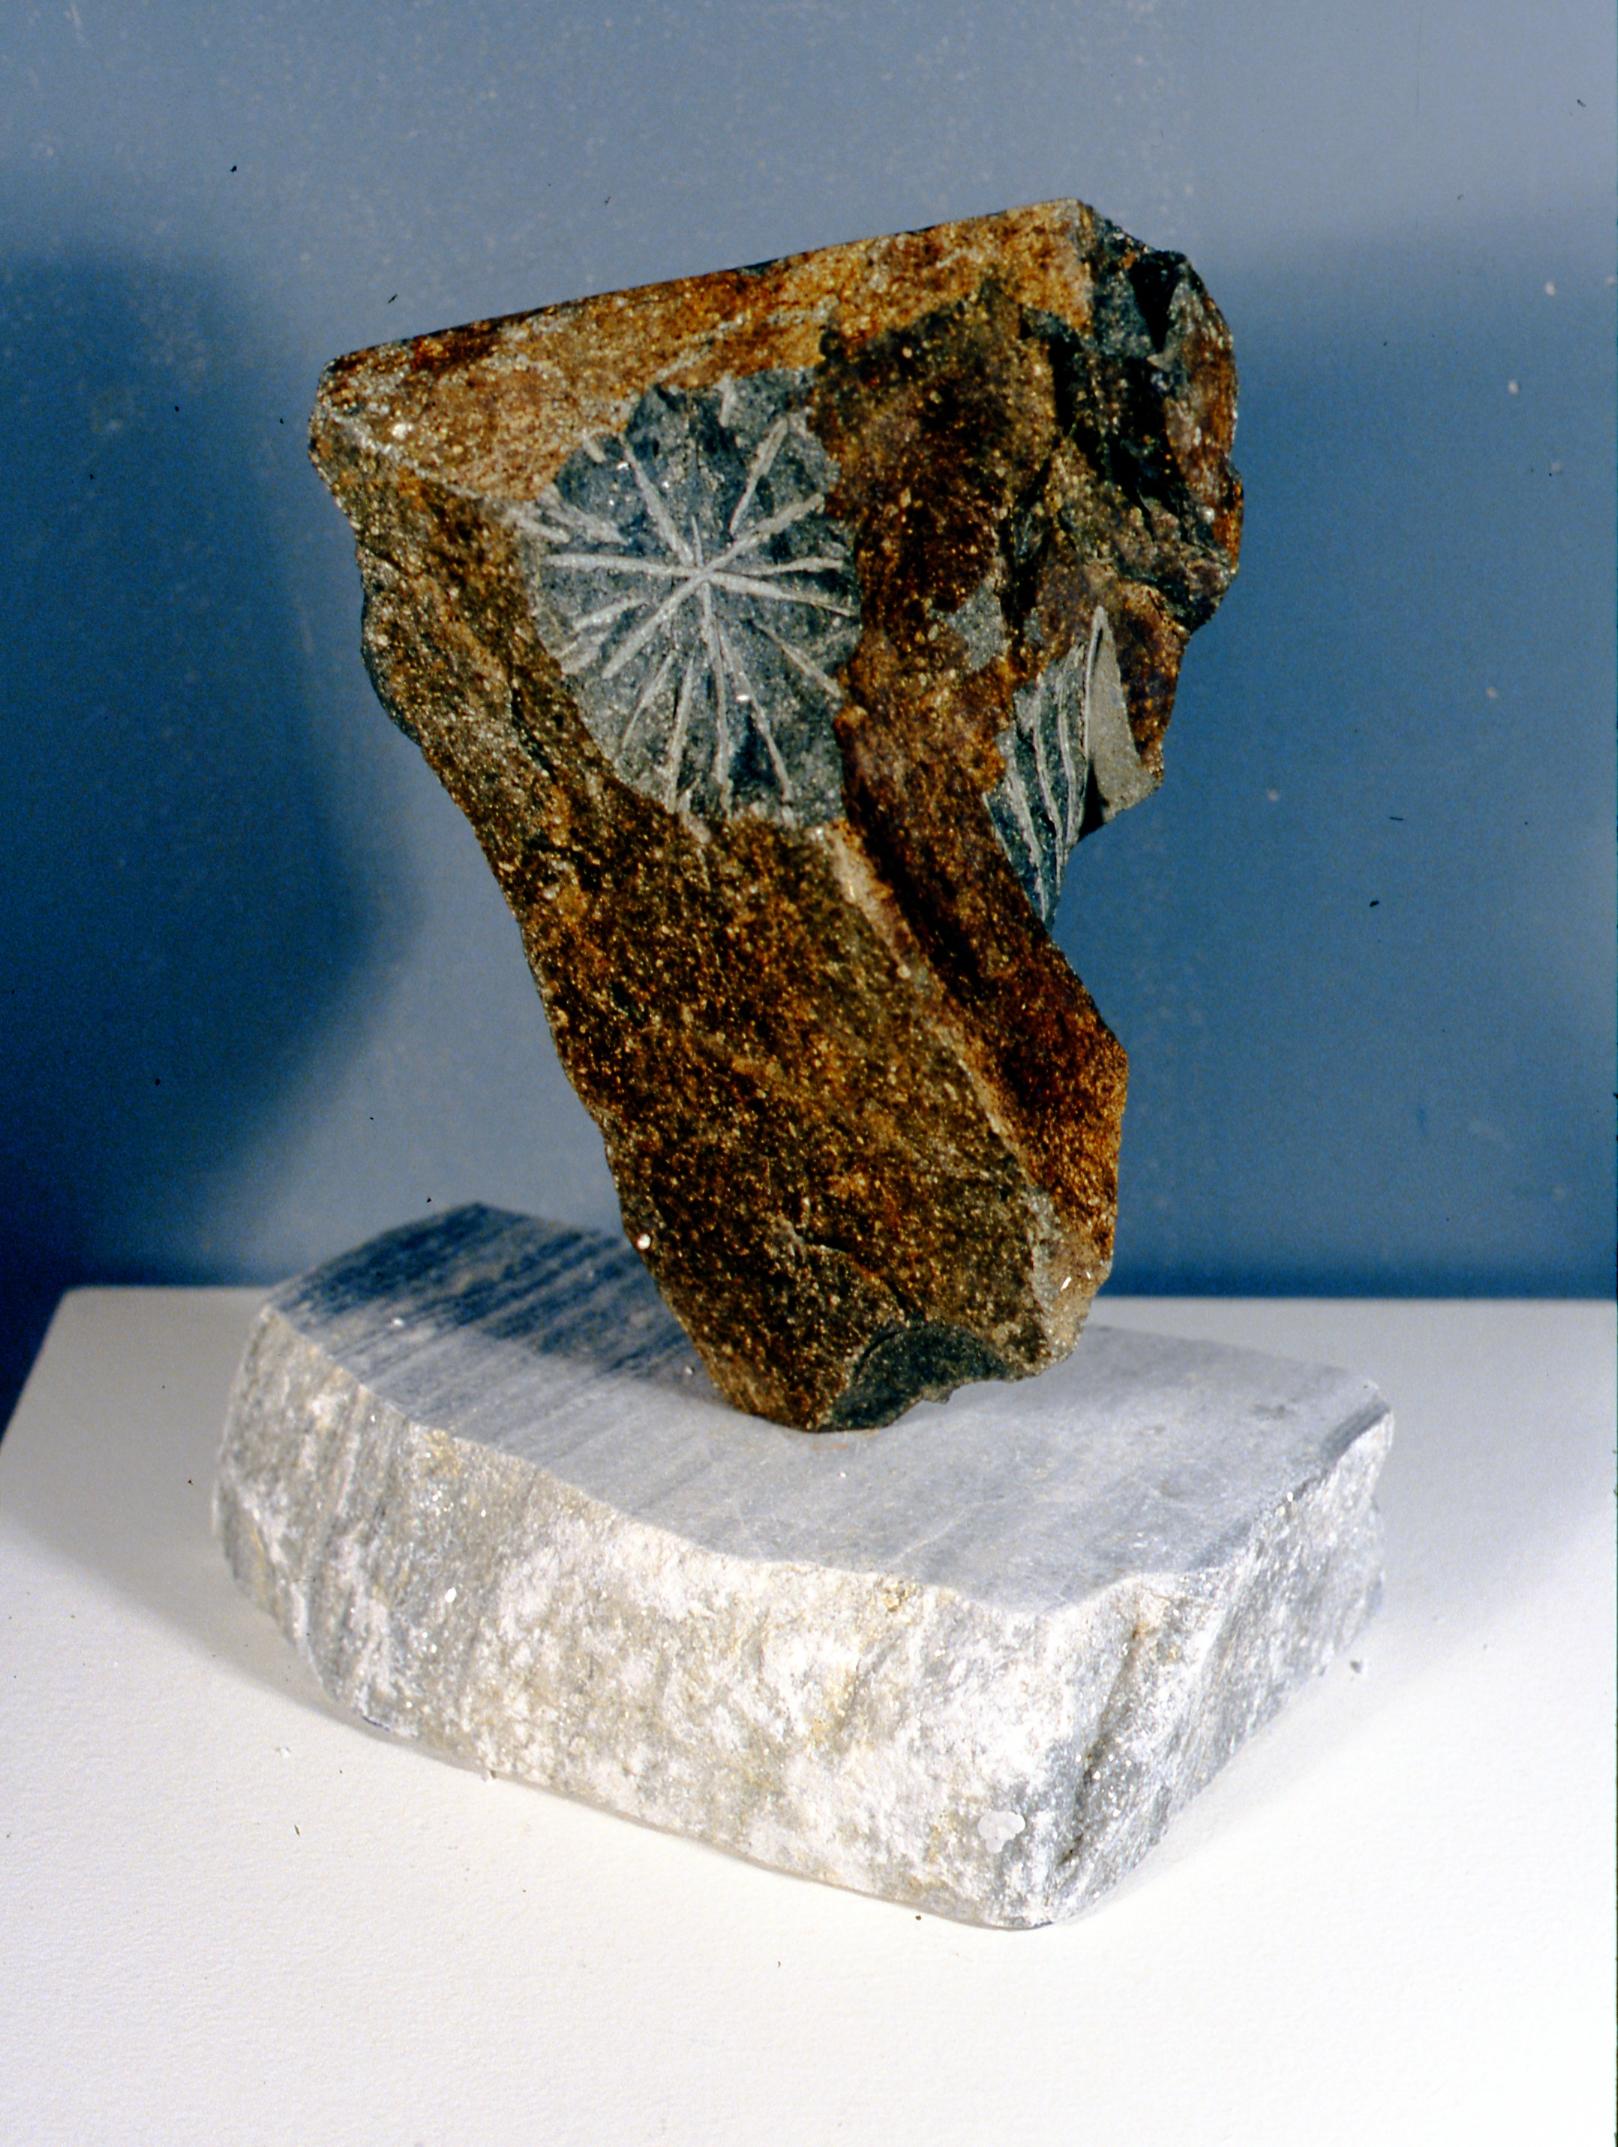 Uncarved Bock: Okanagan (view 2),2002, Jon Barlow Hudson, rock sculpture, 35 cm tall, 2002.06.01, gift of the artist